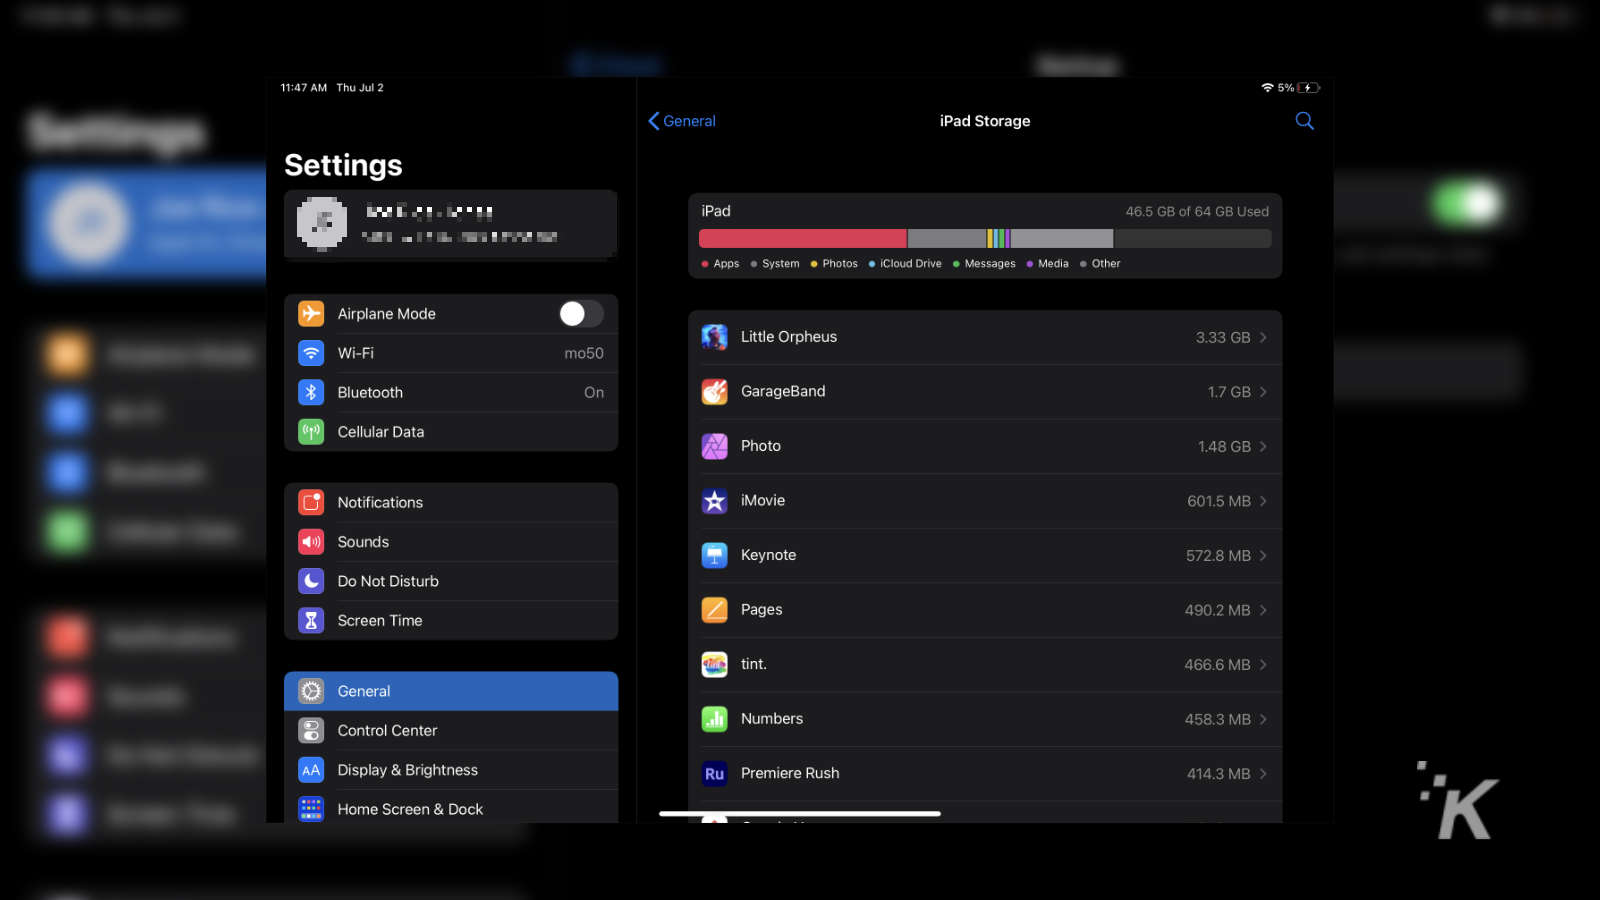 ipad storage settings menu